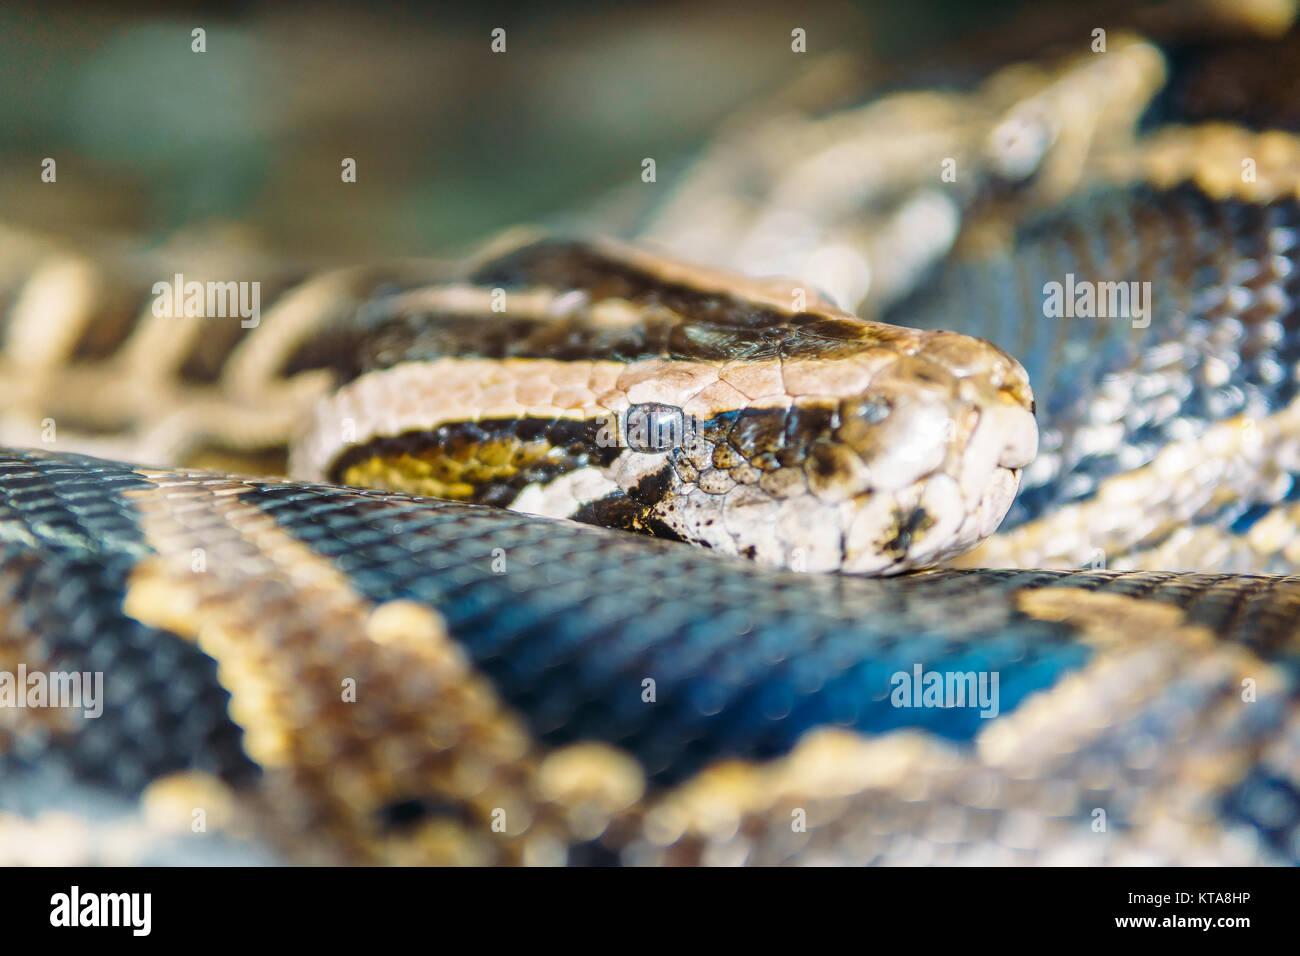 Snake Head Closeup - Stock Image